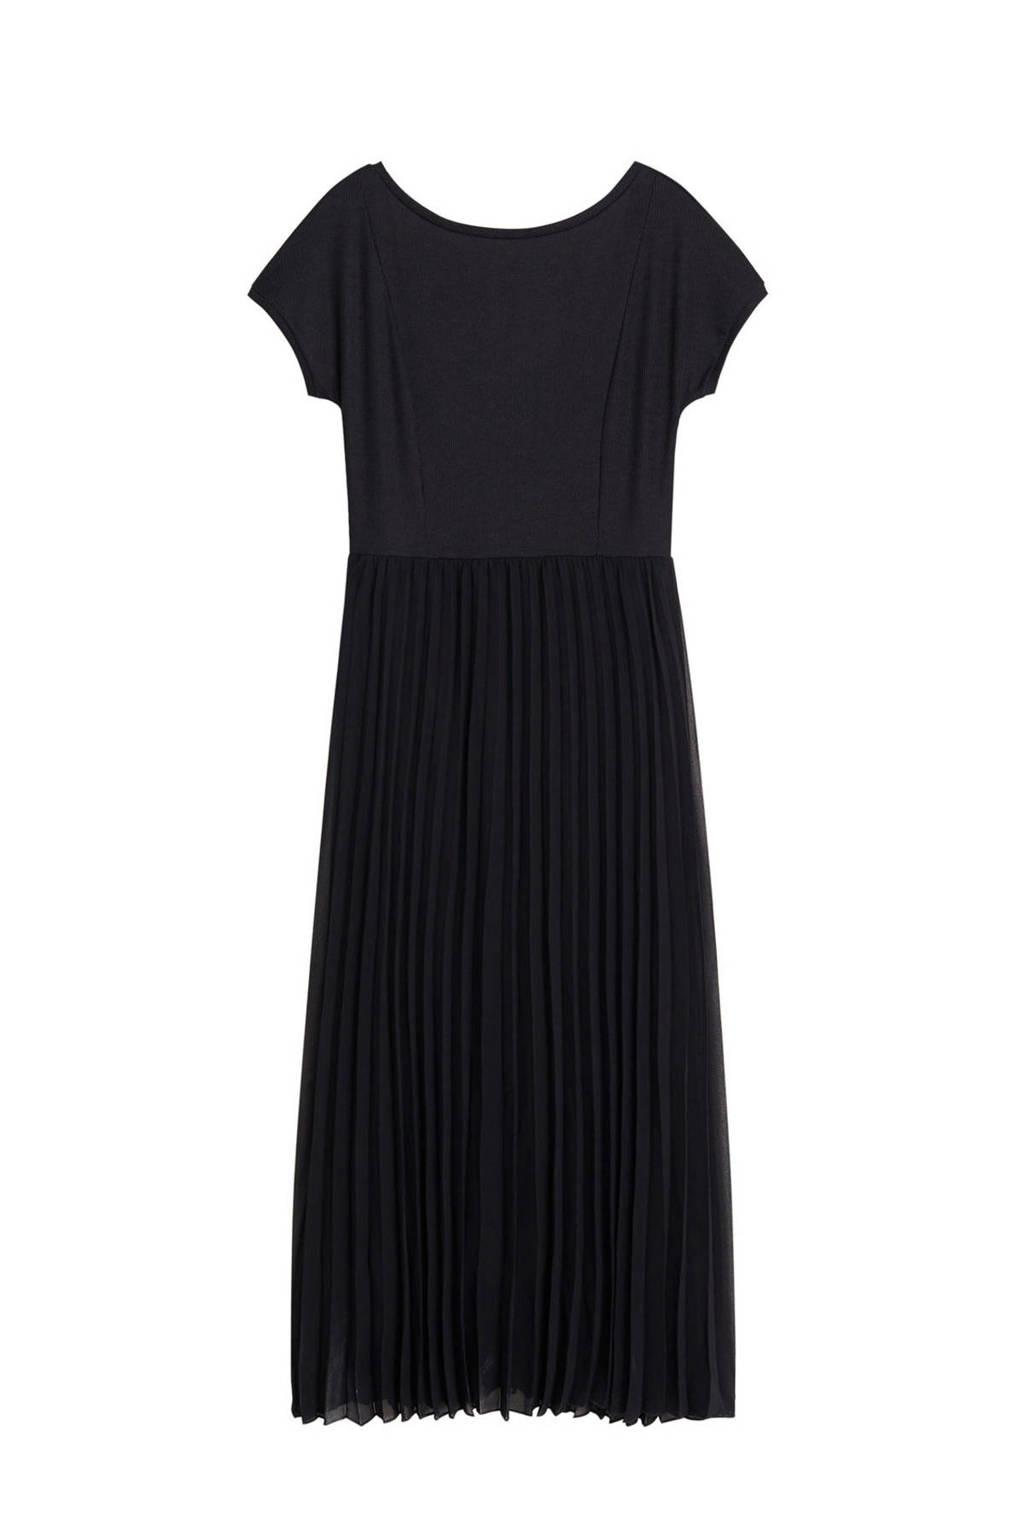 Mango semi-transparante jurk zwart, Zwart